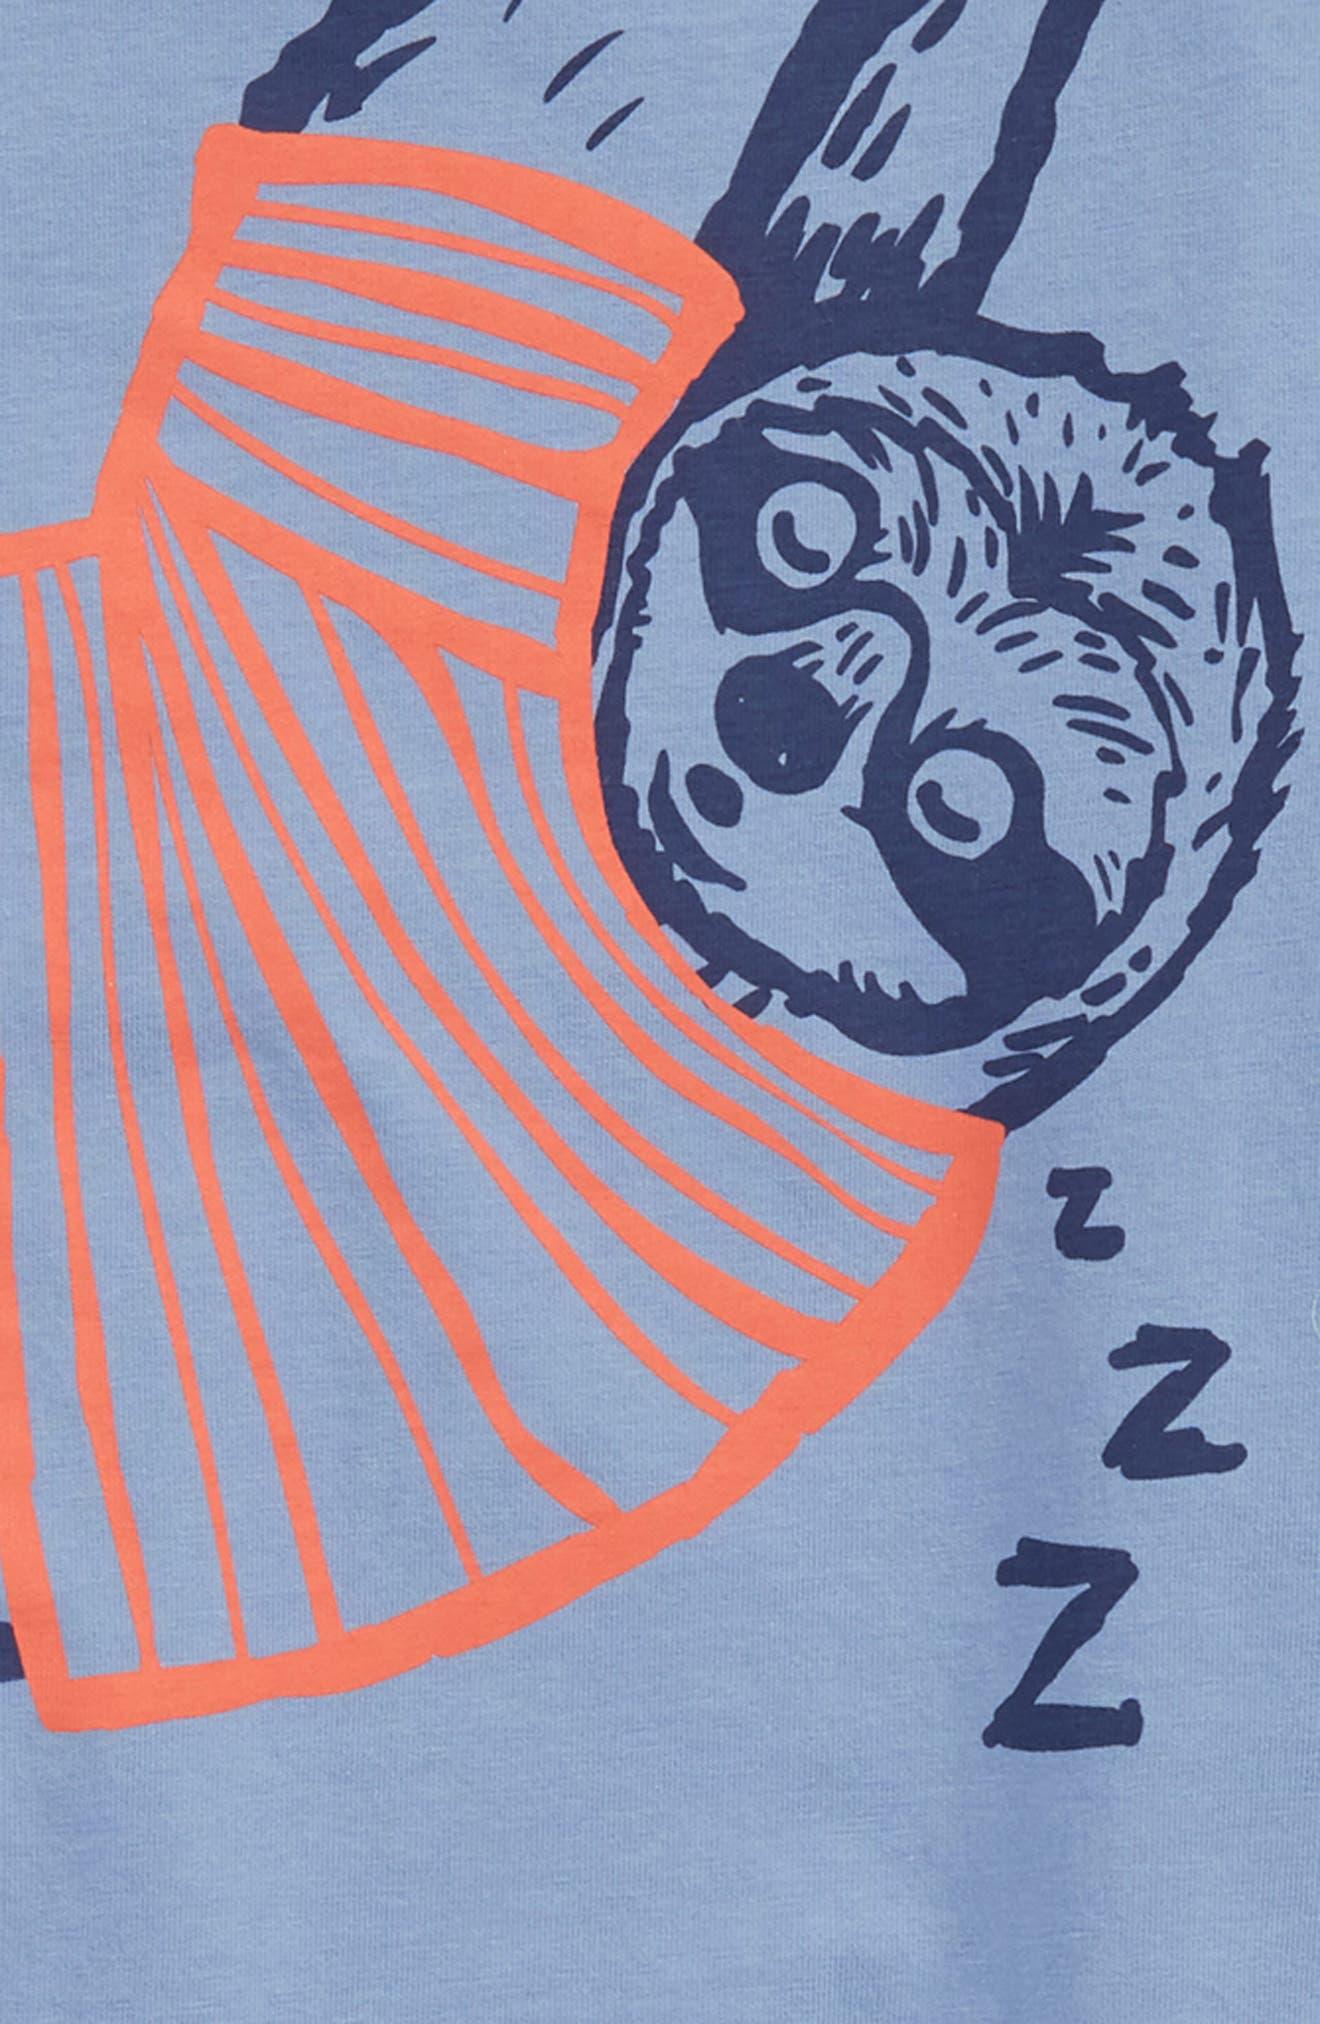 Arty Sloth T-Shirt,                             Alternate thumbnail 2, color,                             Hook Blue Sloth